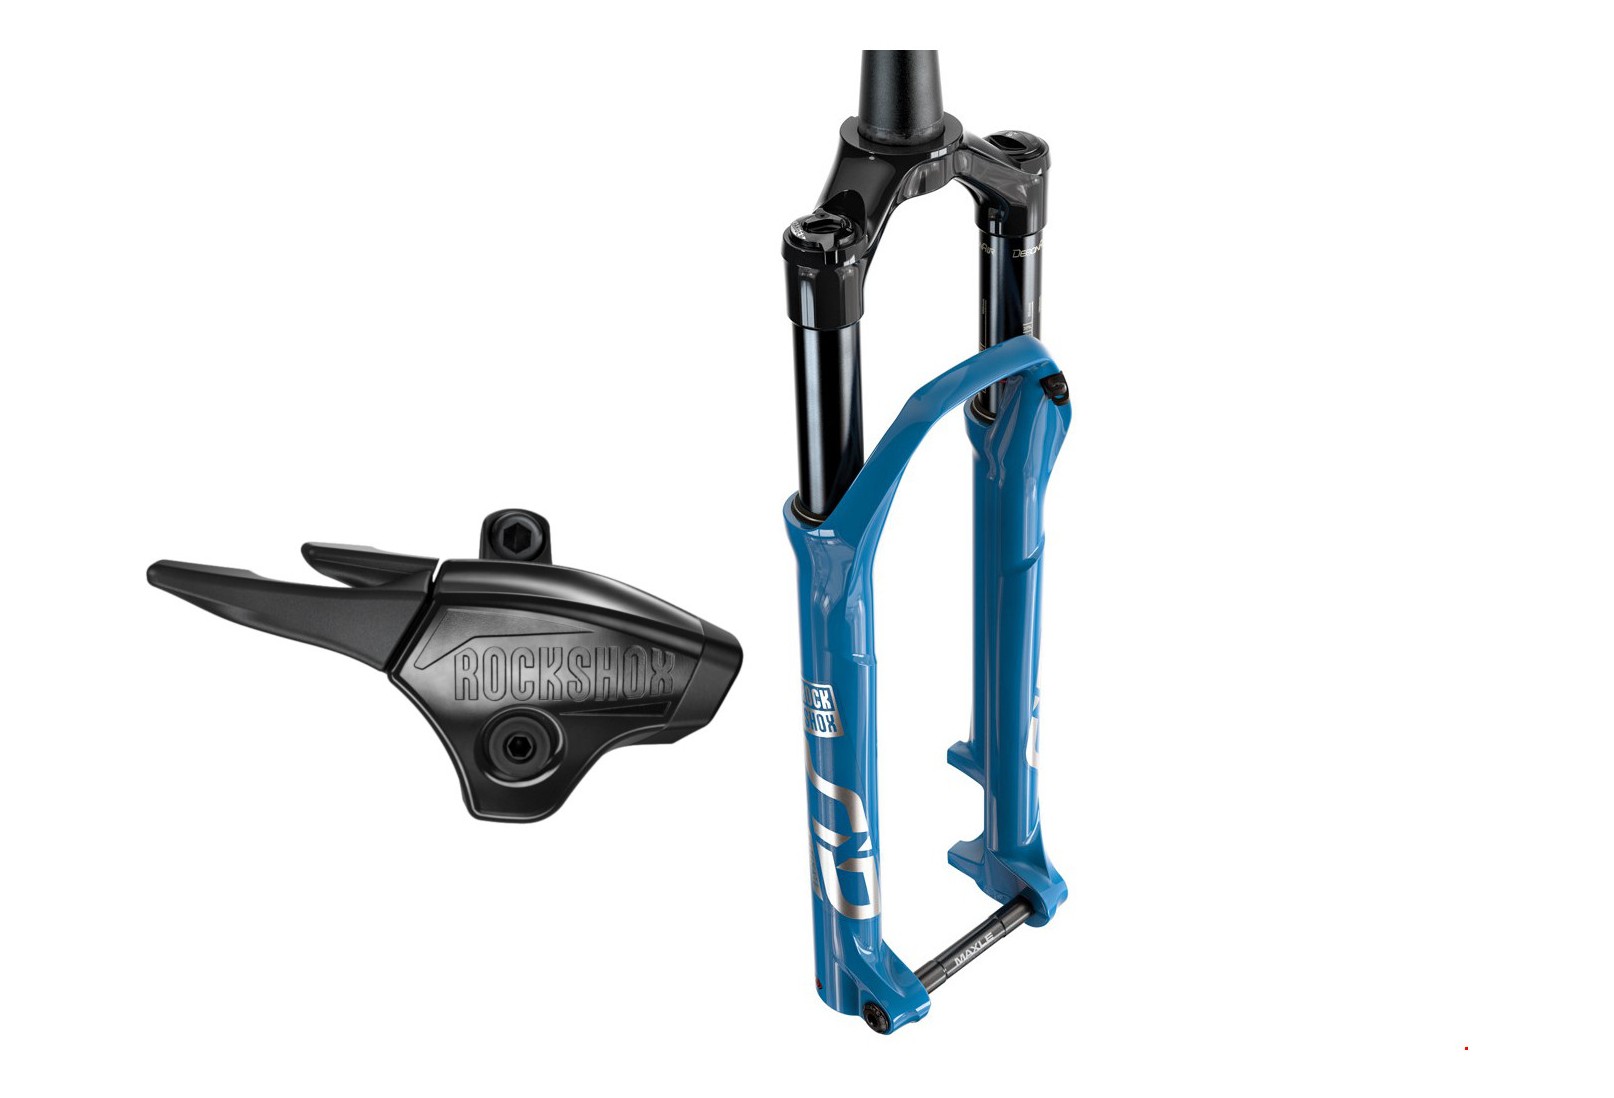 Rockshox Sid Ultimate RLC fork 27 5 '' Oneloc | Boost 15x110mm | Offset 42  | Blue 2020